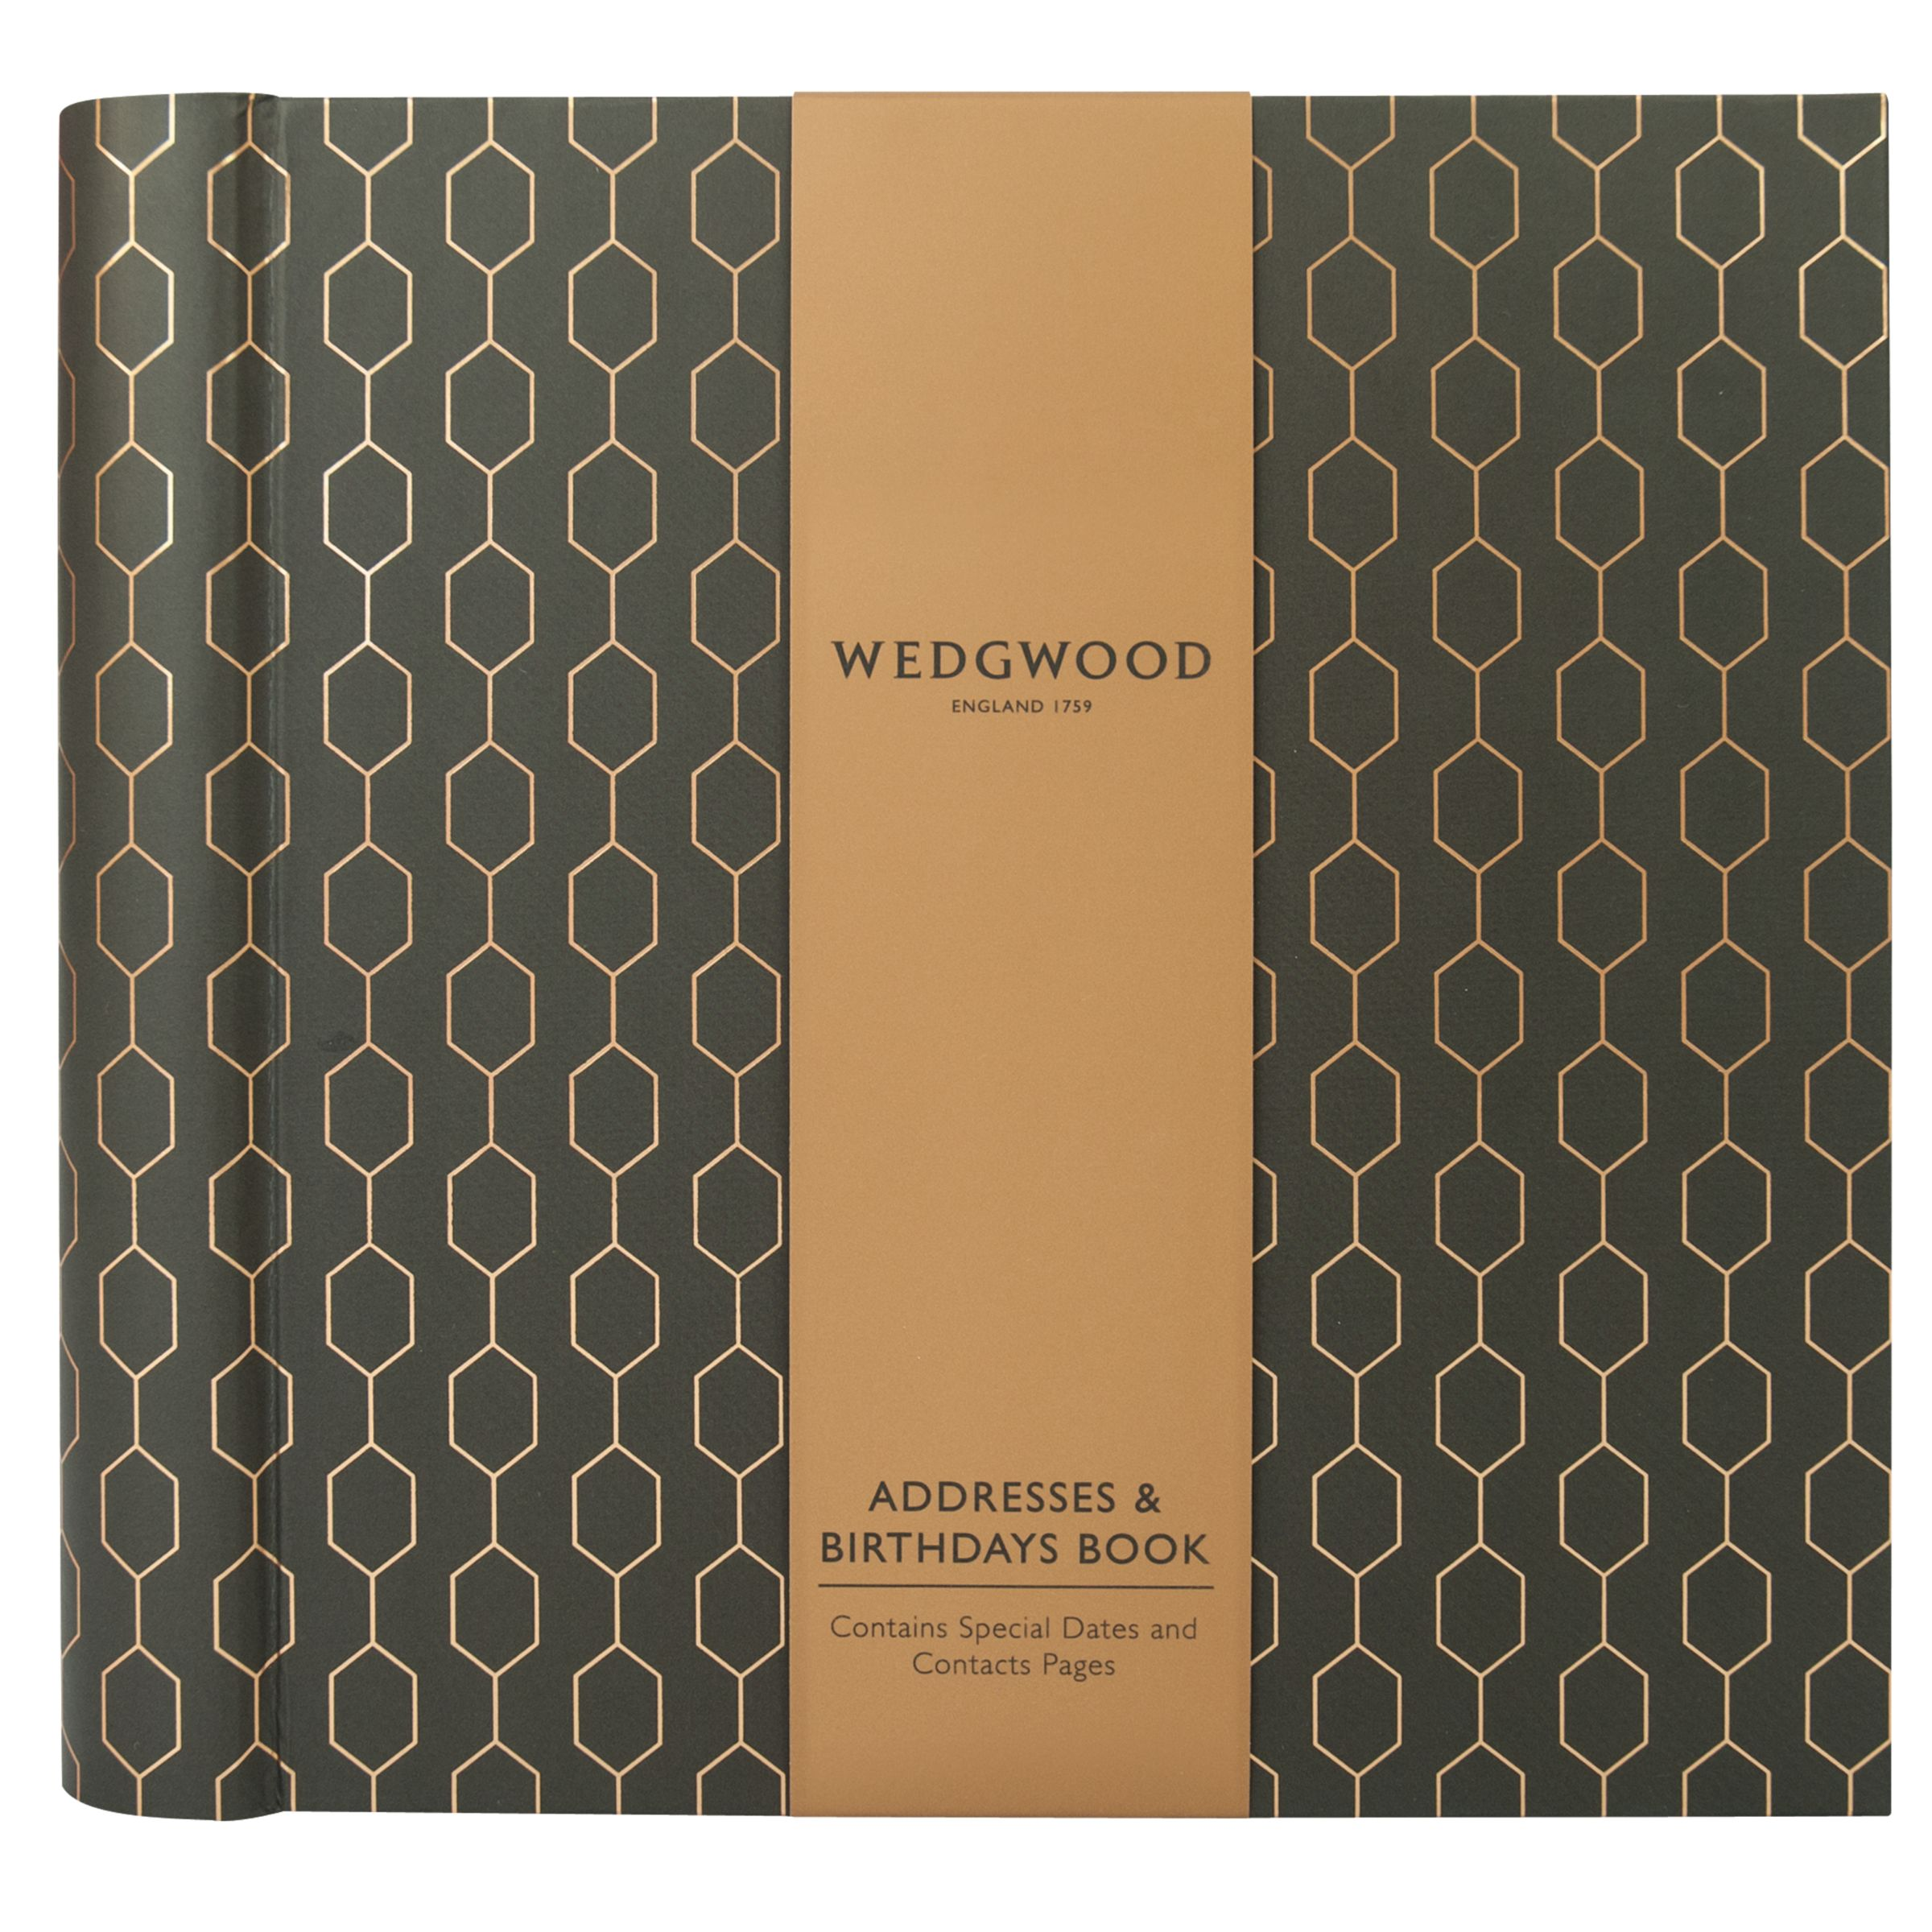 Wedgwood Wedgwood Addresses and Birthdays Book